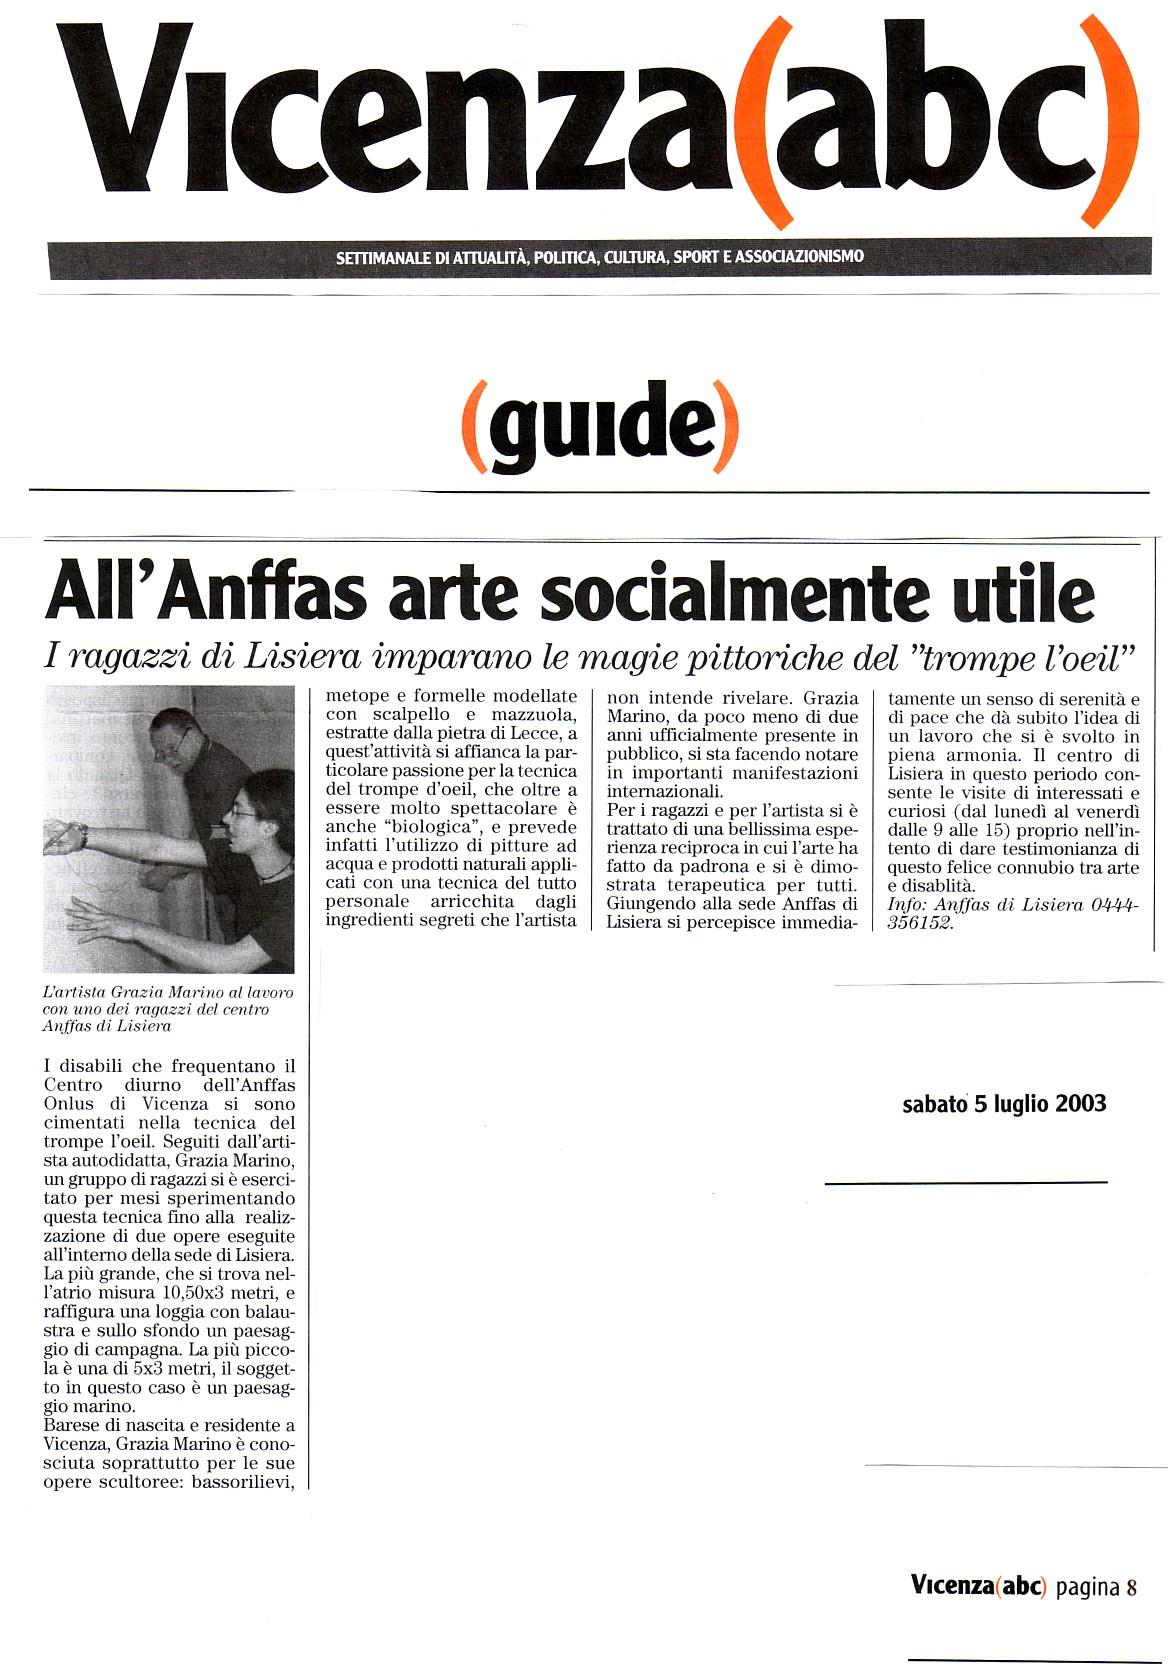 Vicenza abc-lug.'03